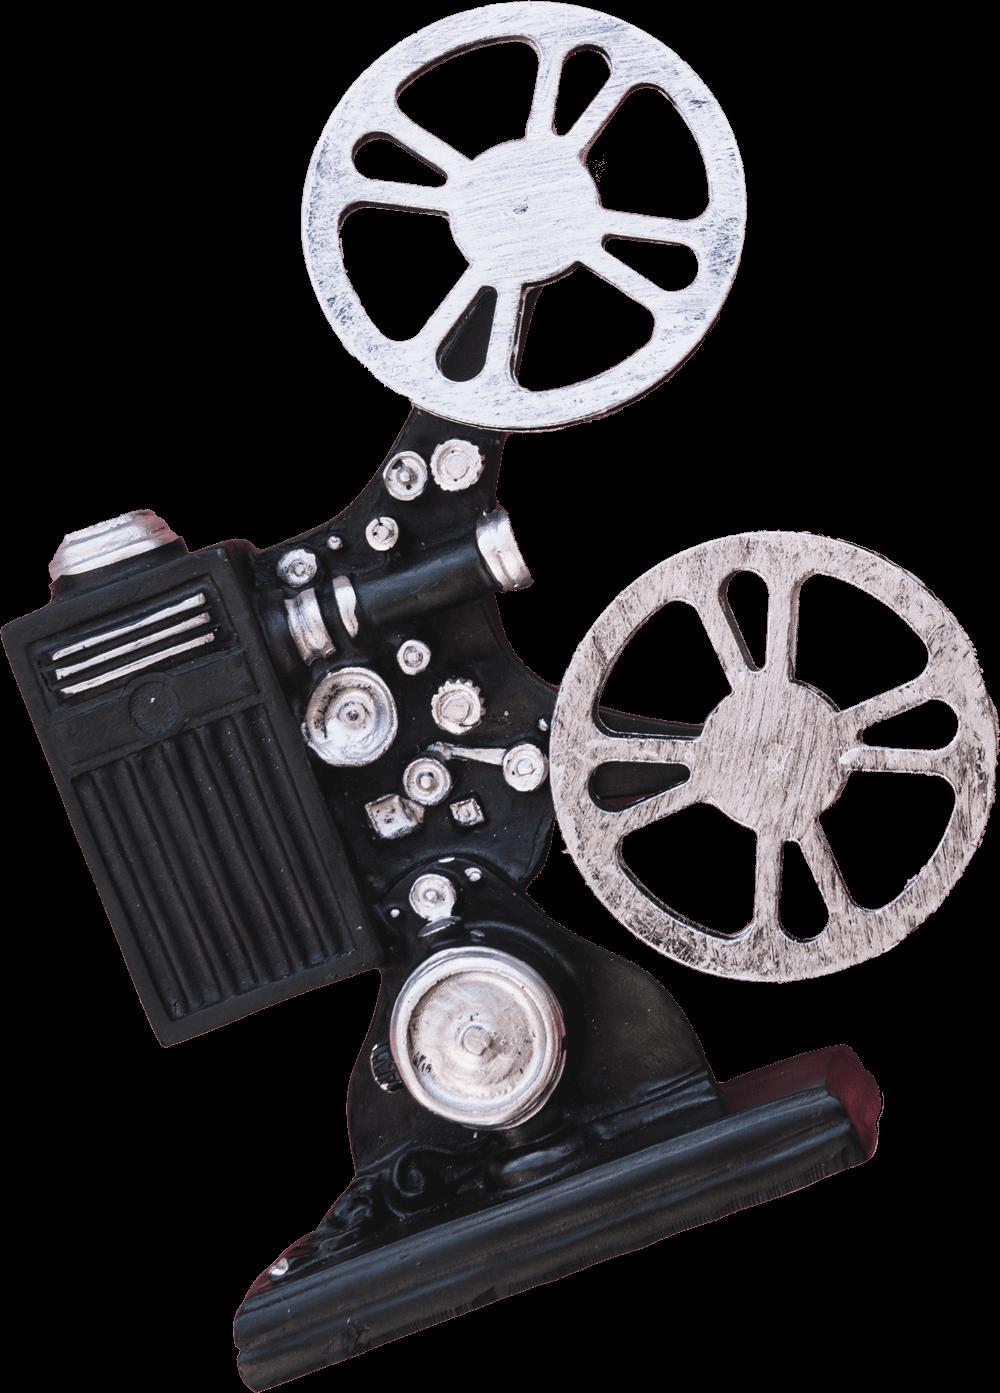 imagen de camara cinematrográfica clásica